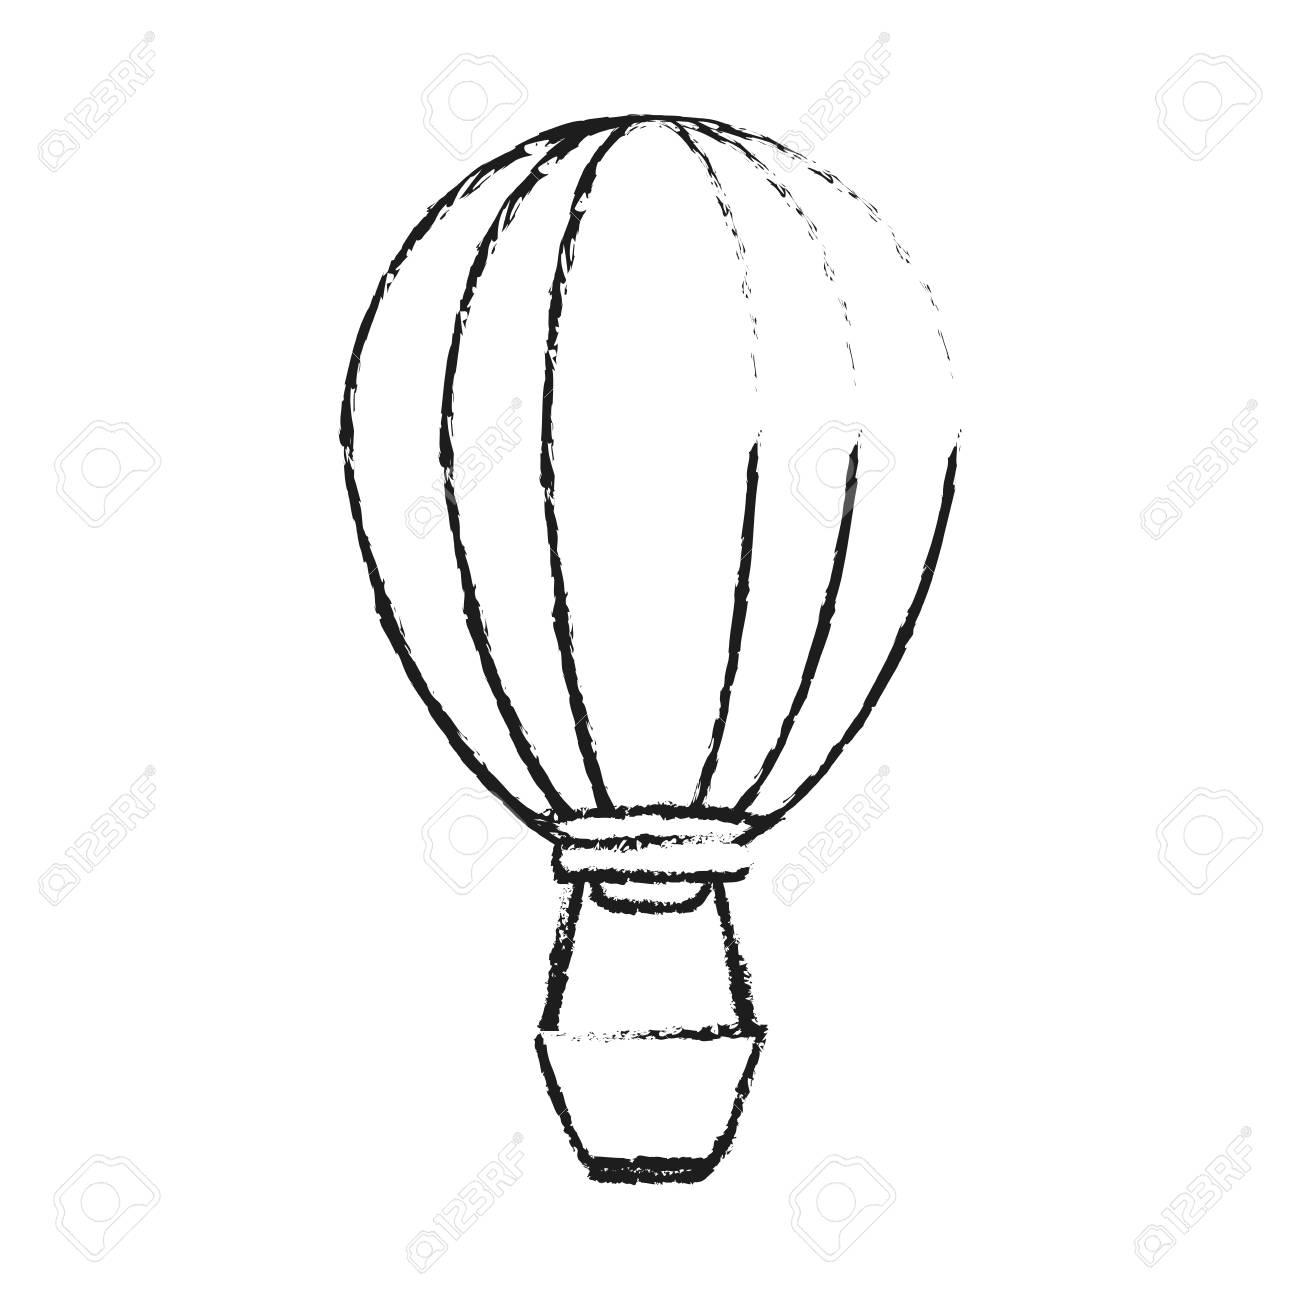 1300x1300 Black Blurred Silhouette Cartoon Hot Air Balloon With Basket